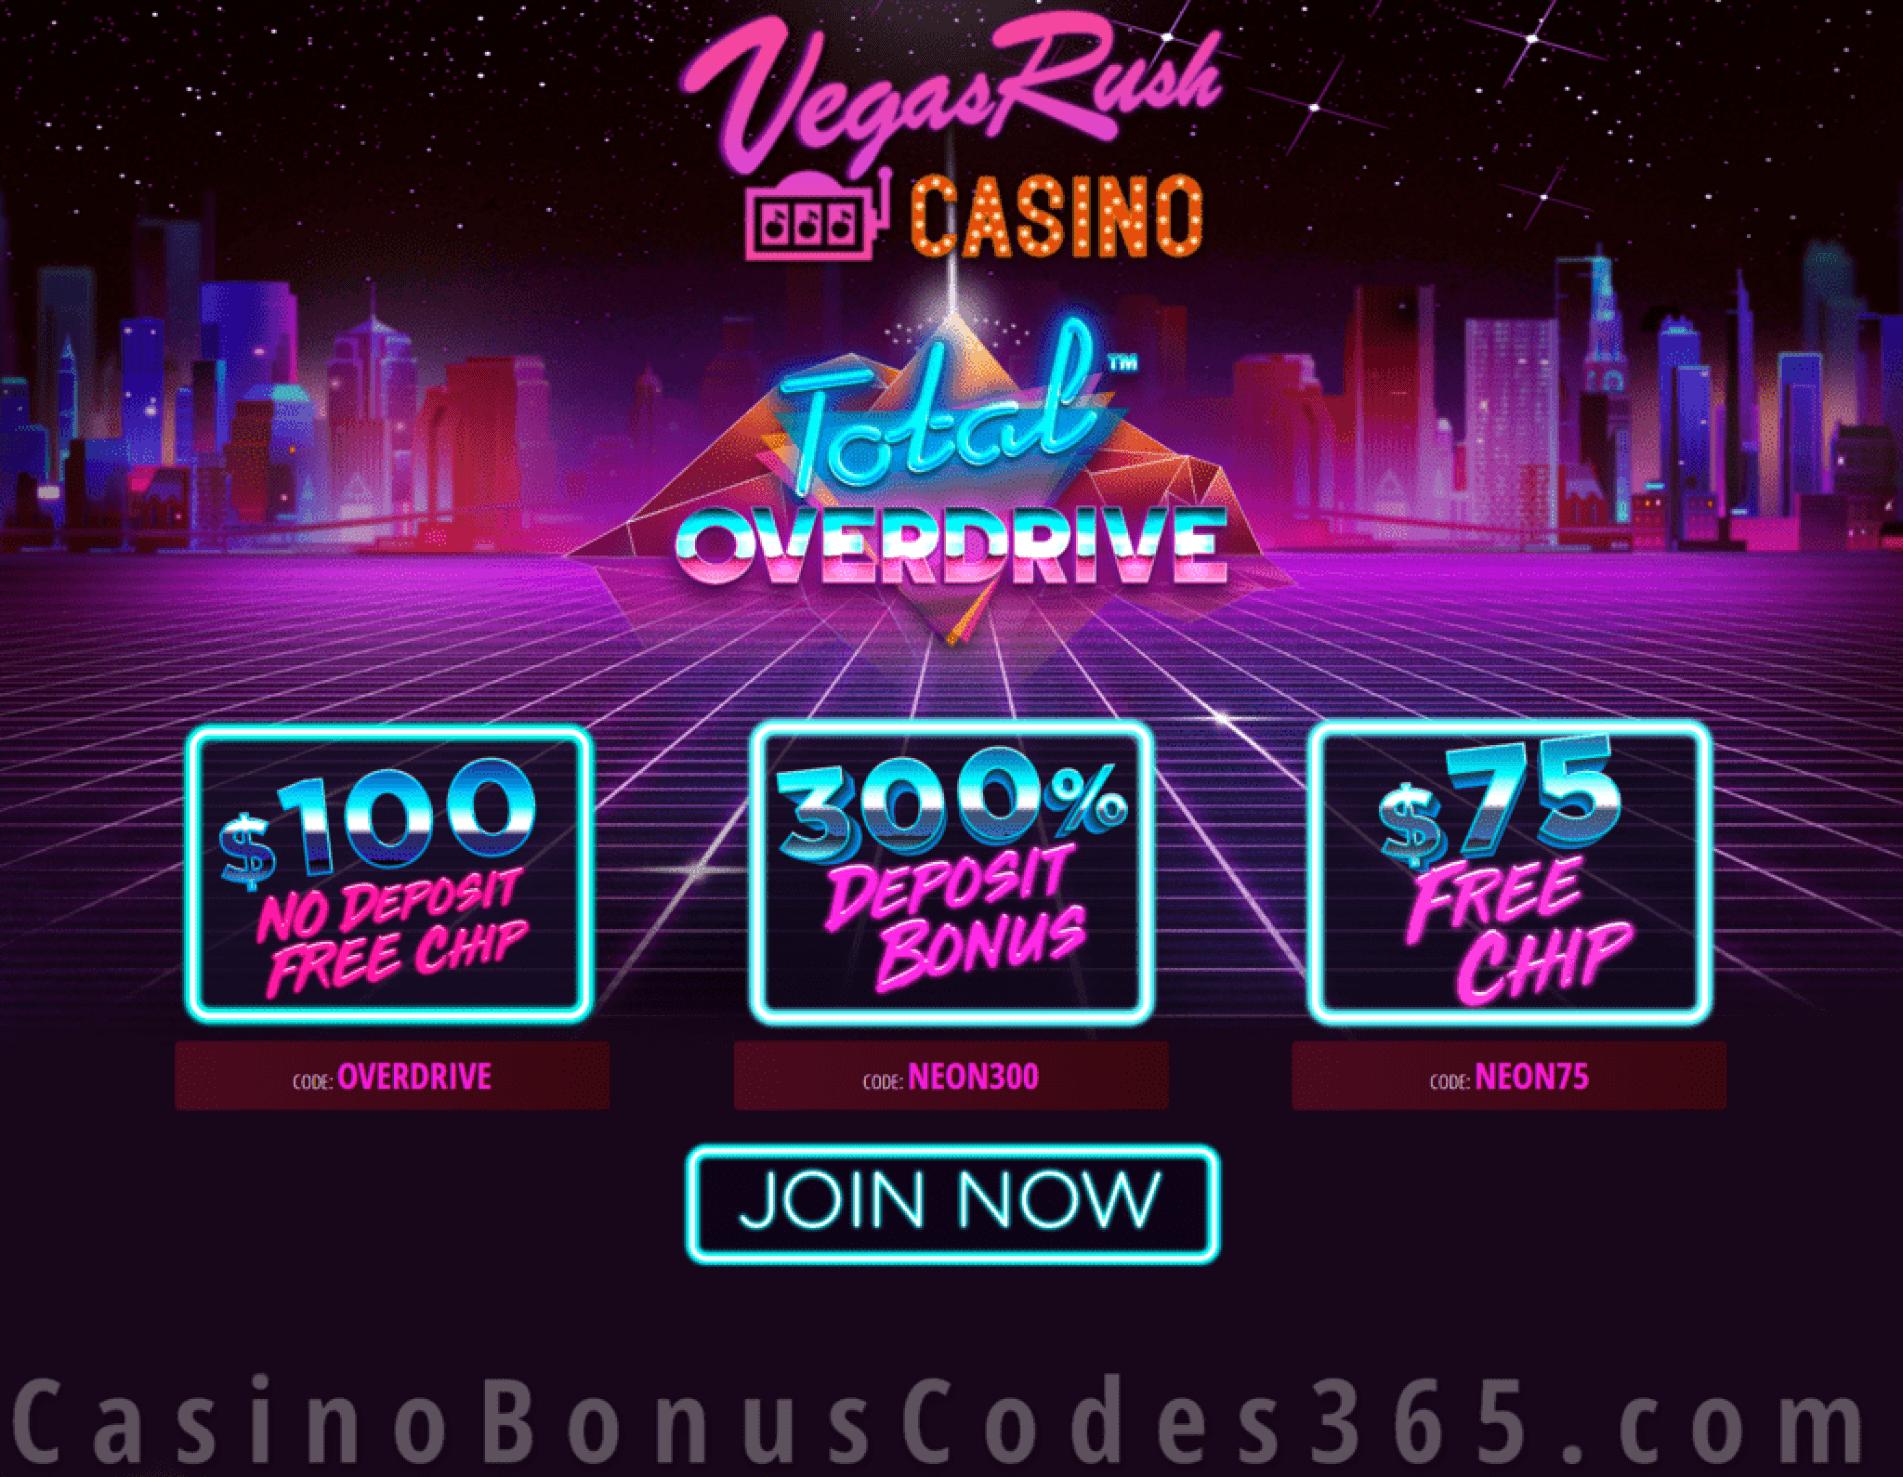 Vegas Rush Casino $175 FREE Chip plus 300% Match Bonus Betsoft Total Overdrive Special April Promo